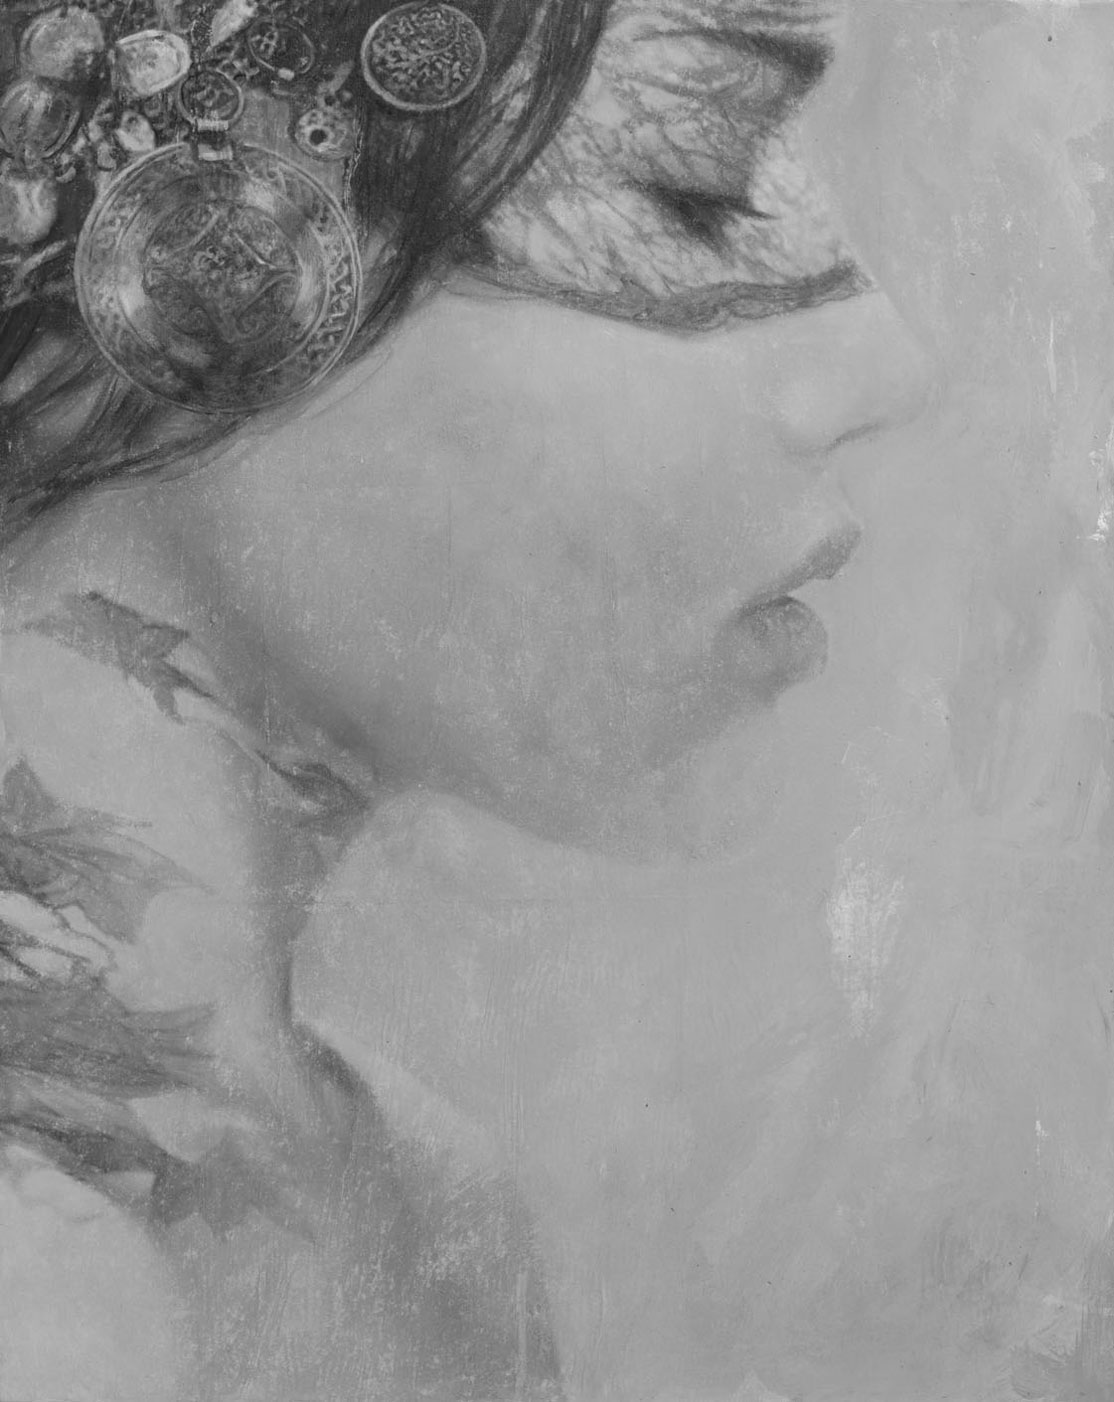 622P - 92 x 73 cm | Goddesses of Nibiru | Tinta, acrilico y oleo sobre lienzo